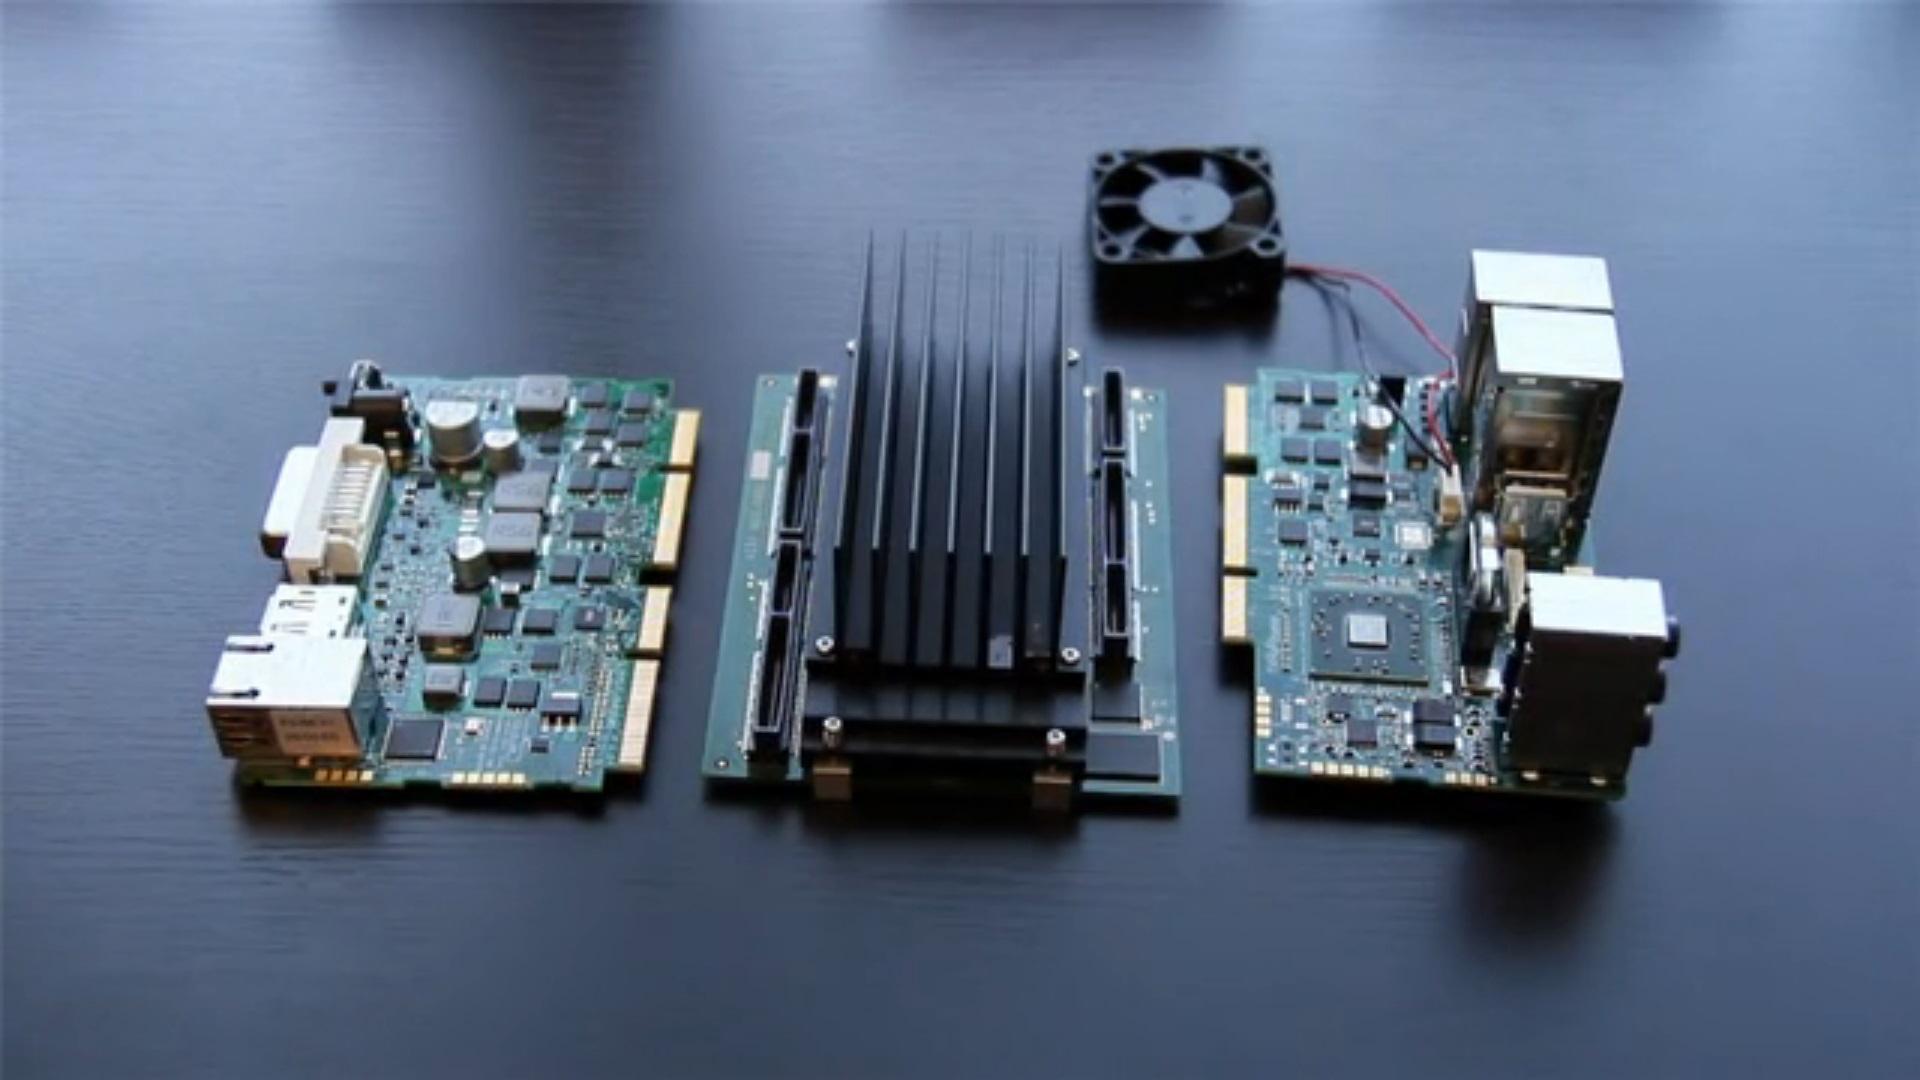 xi3-modular-computer-components.jpg